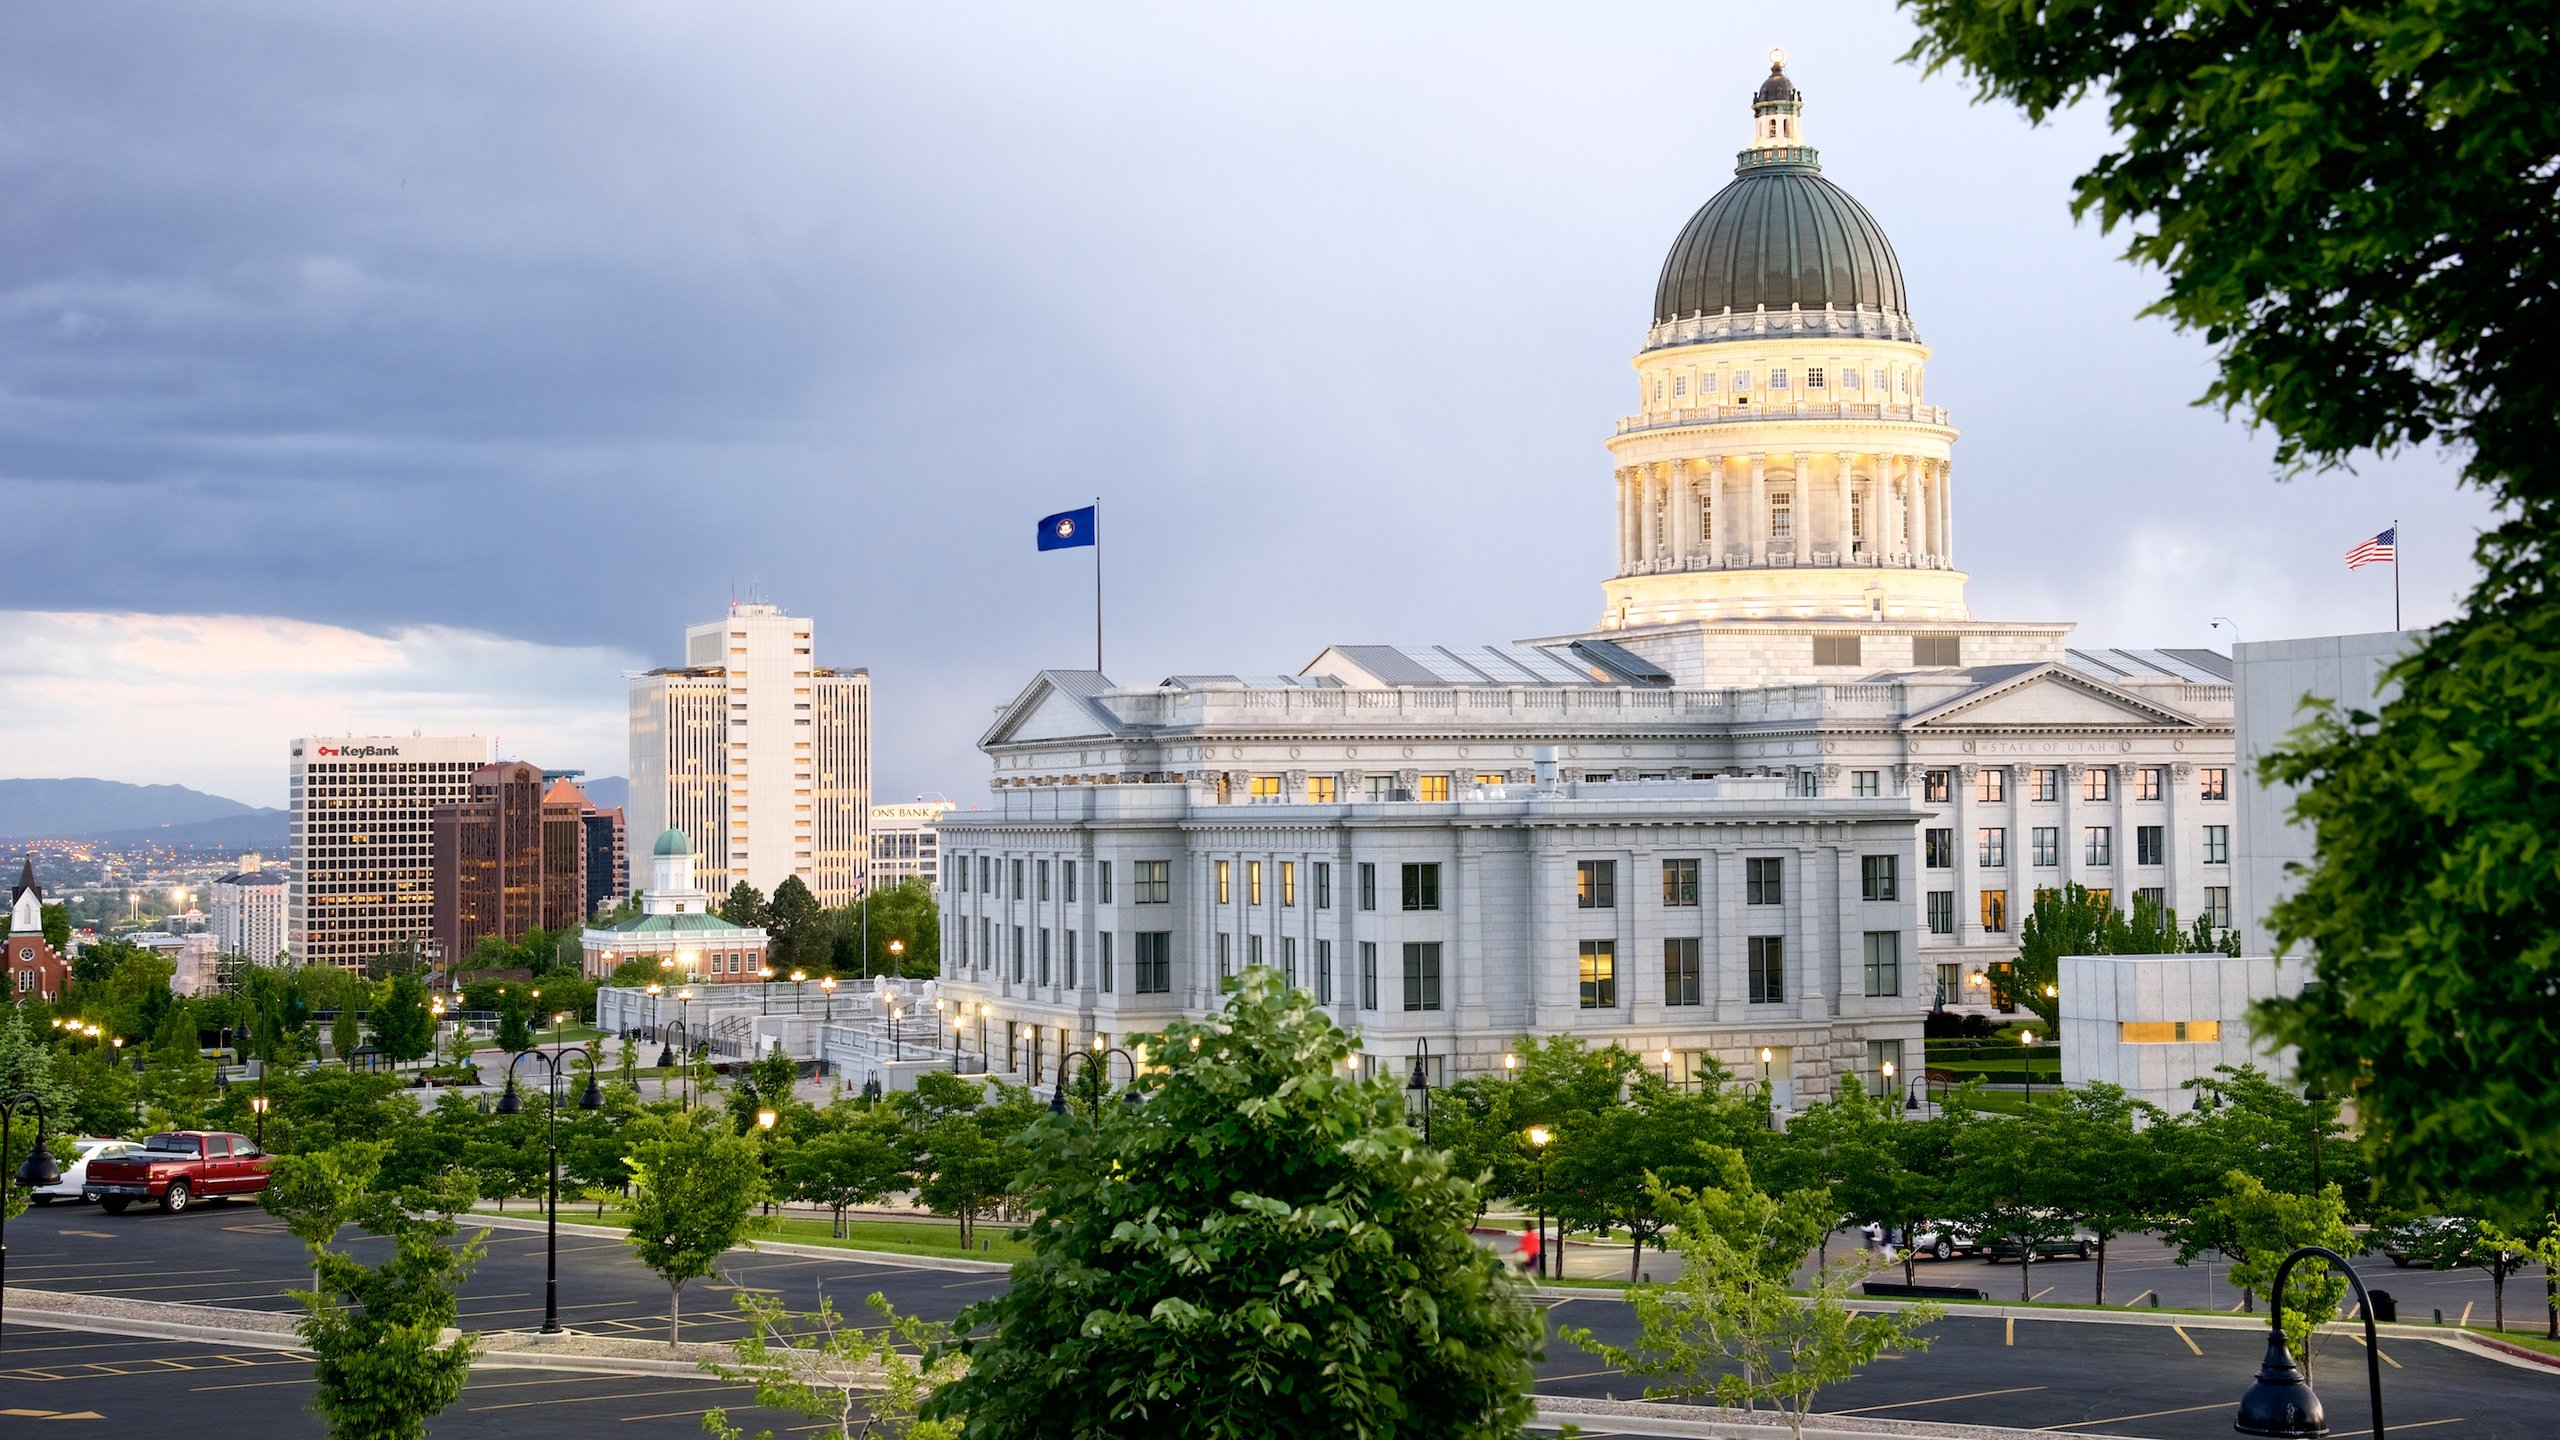 Downtown Salt Lake City, Salt Lake City, Utah, United States of America